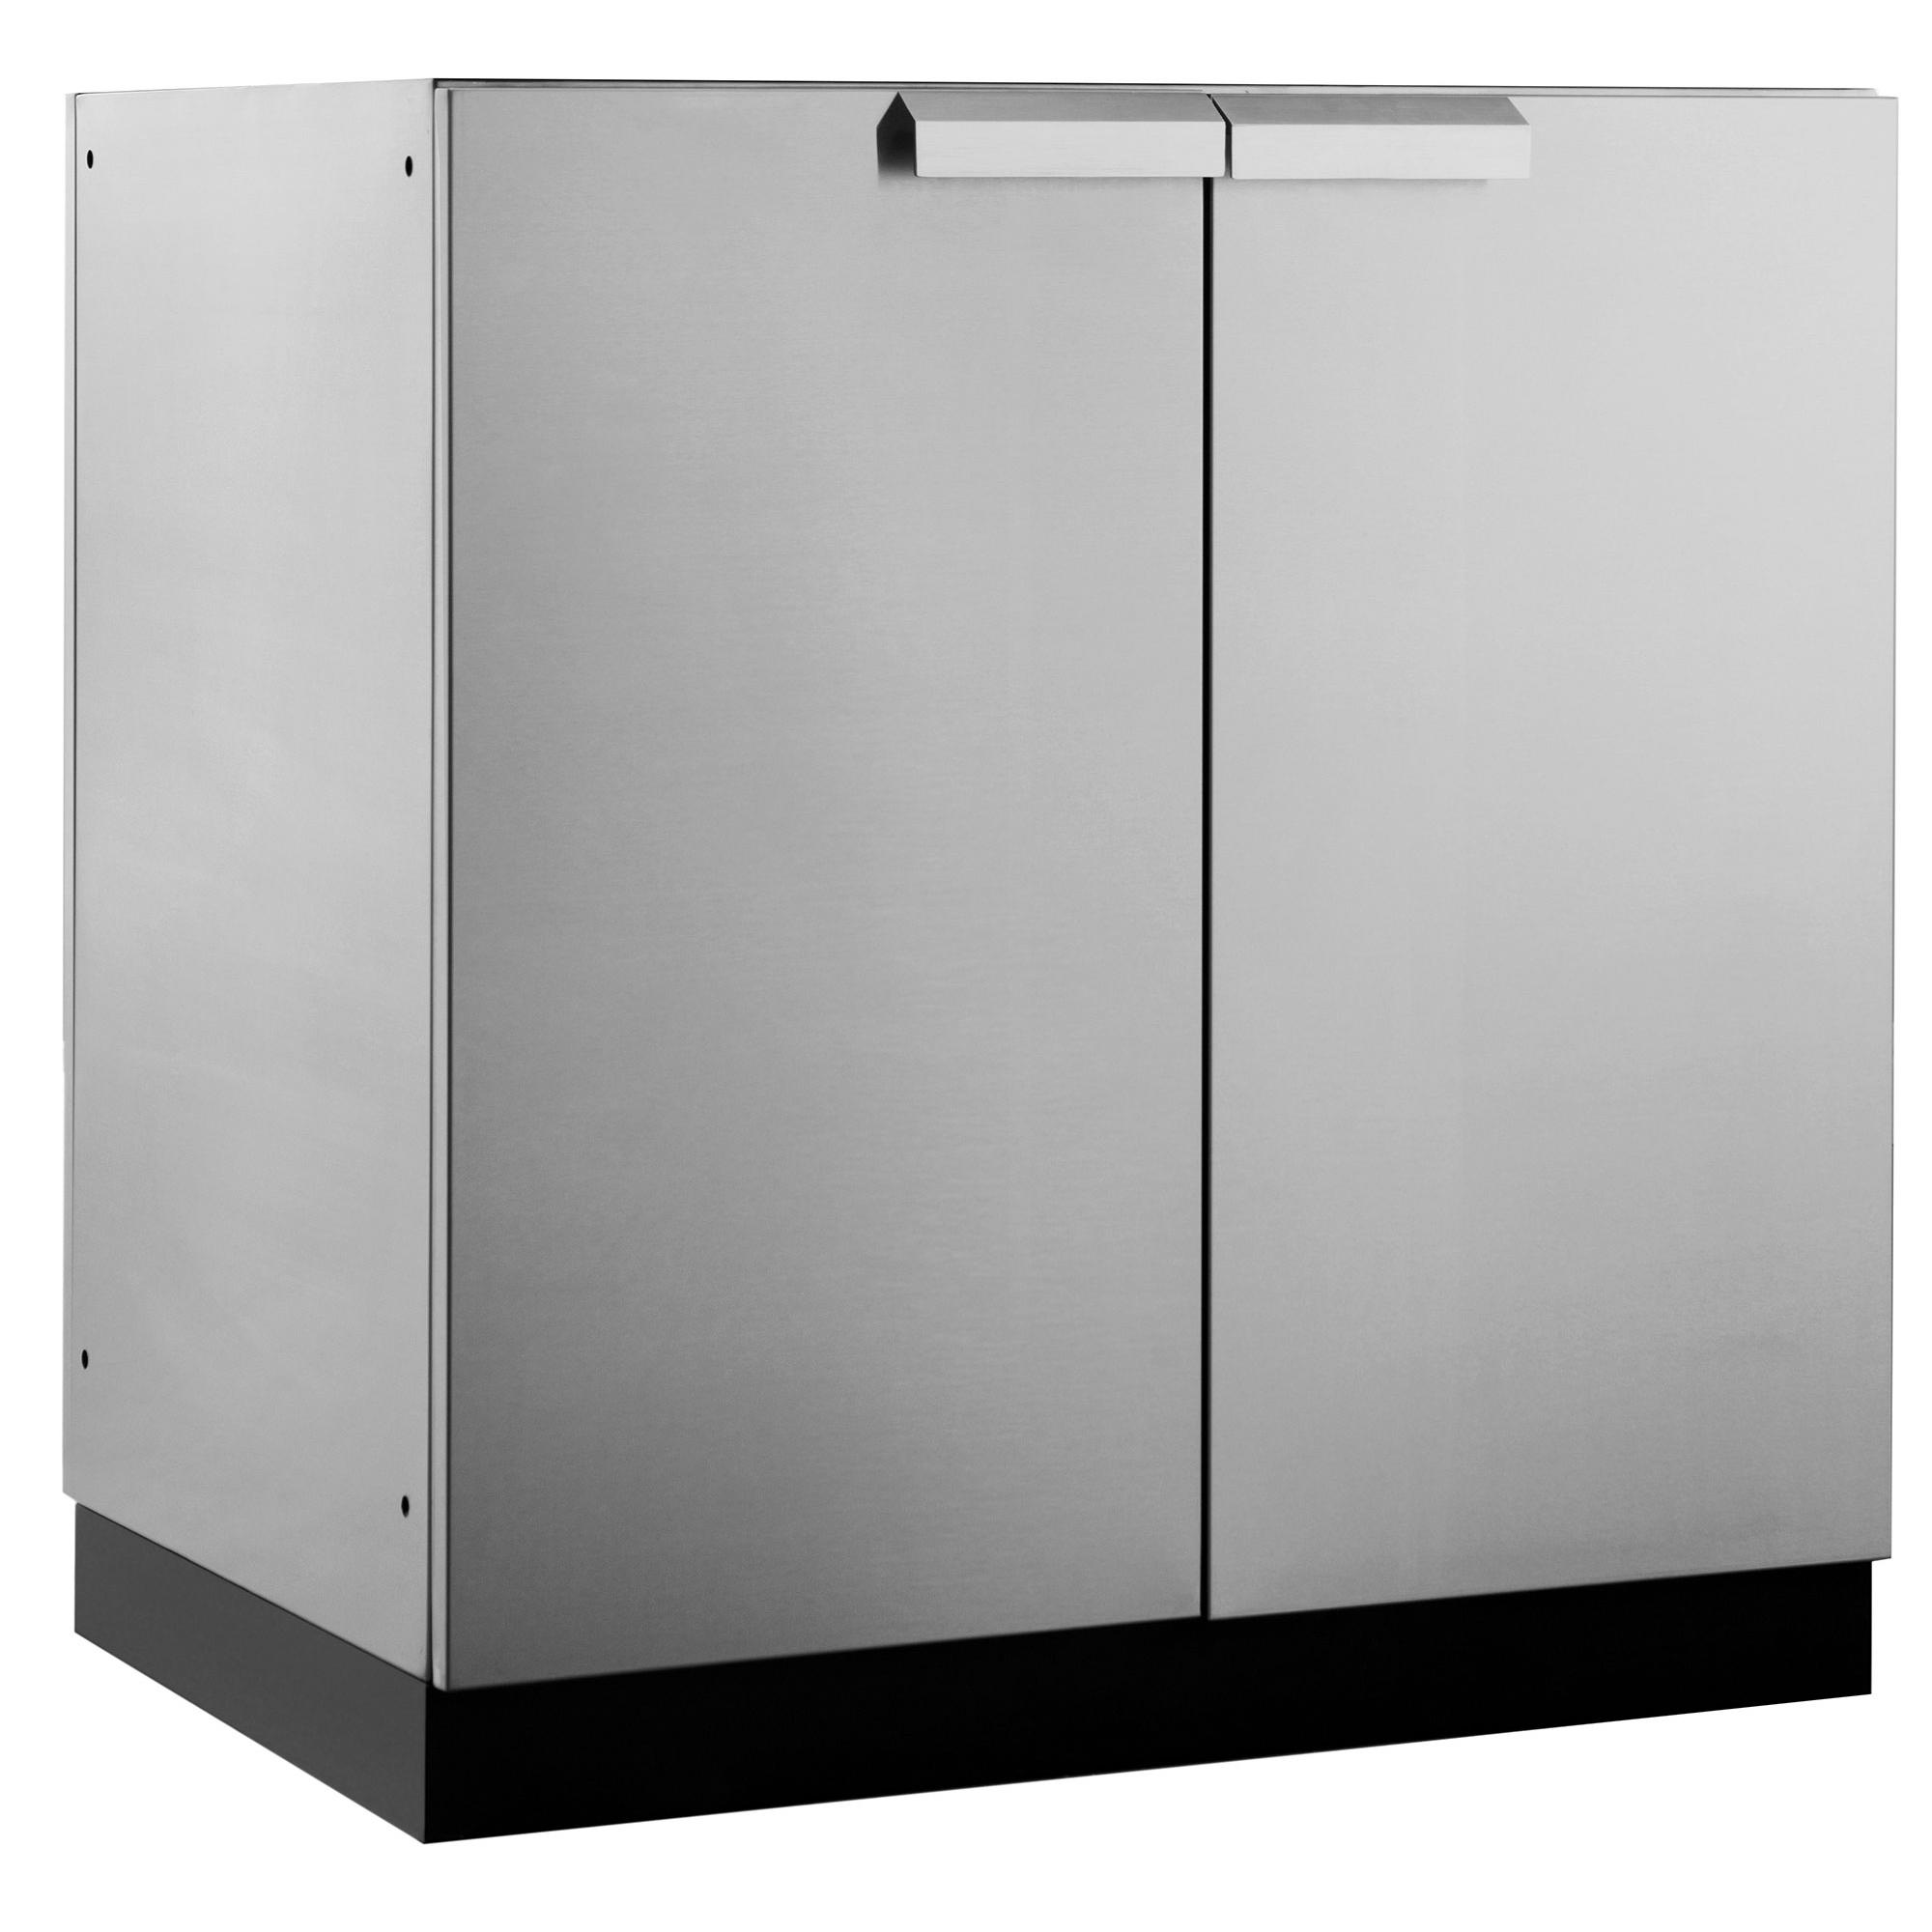 stainless steel restaurant kitchen cabinets kemper newage products outdoor 32 quotw x 23 quotd 2 door cabinet